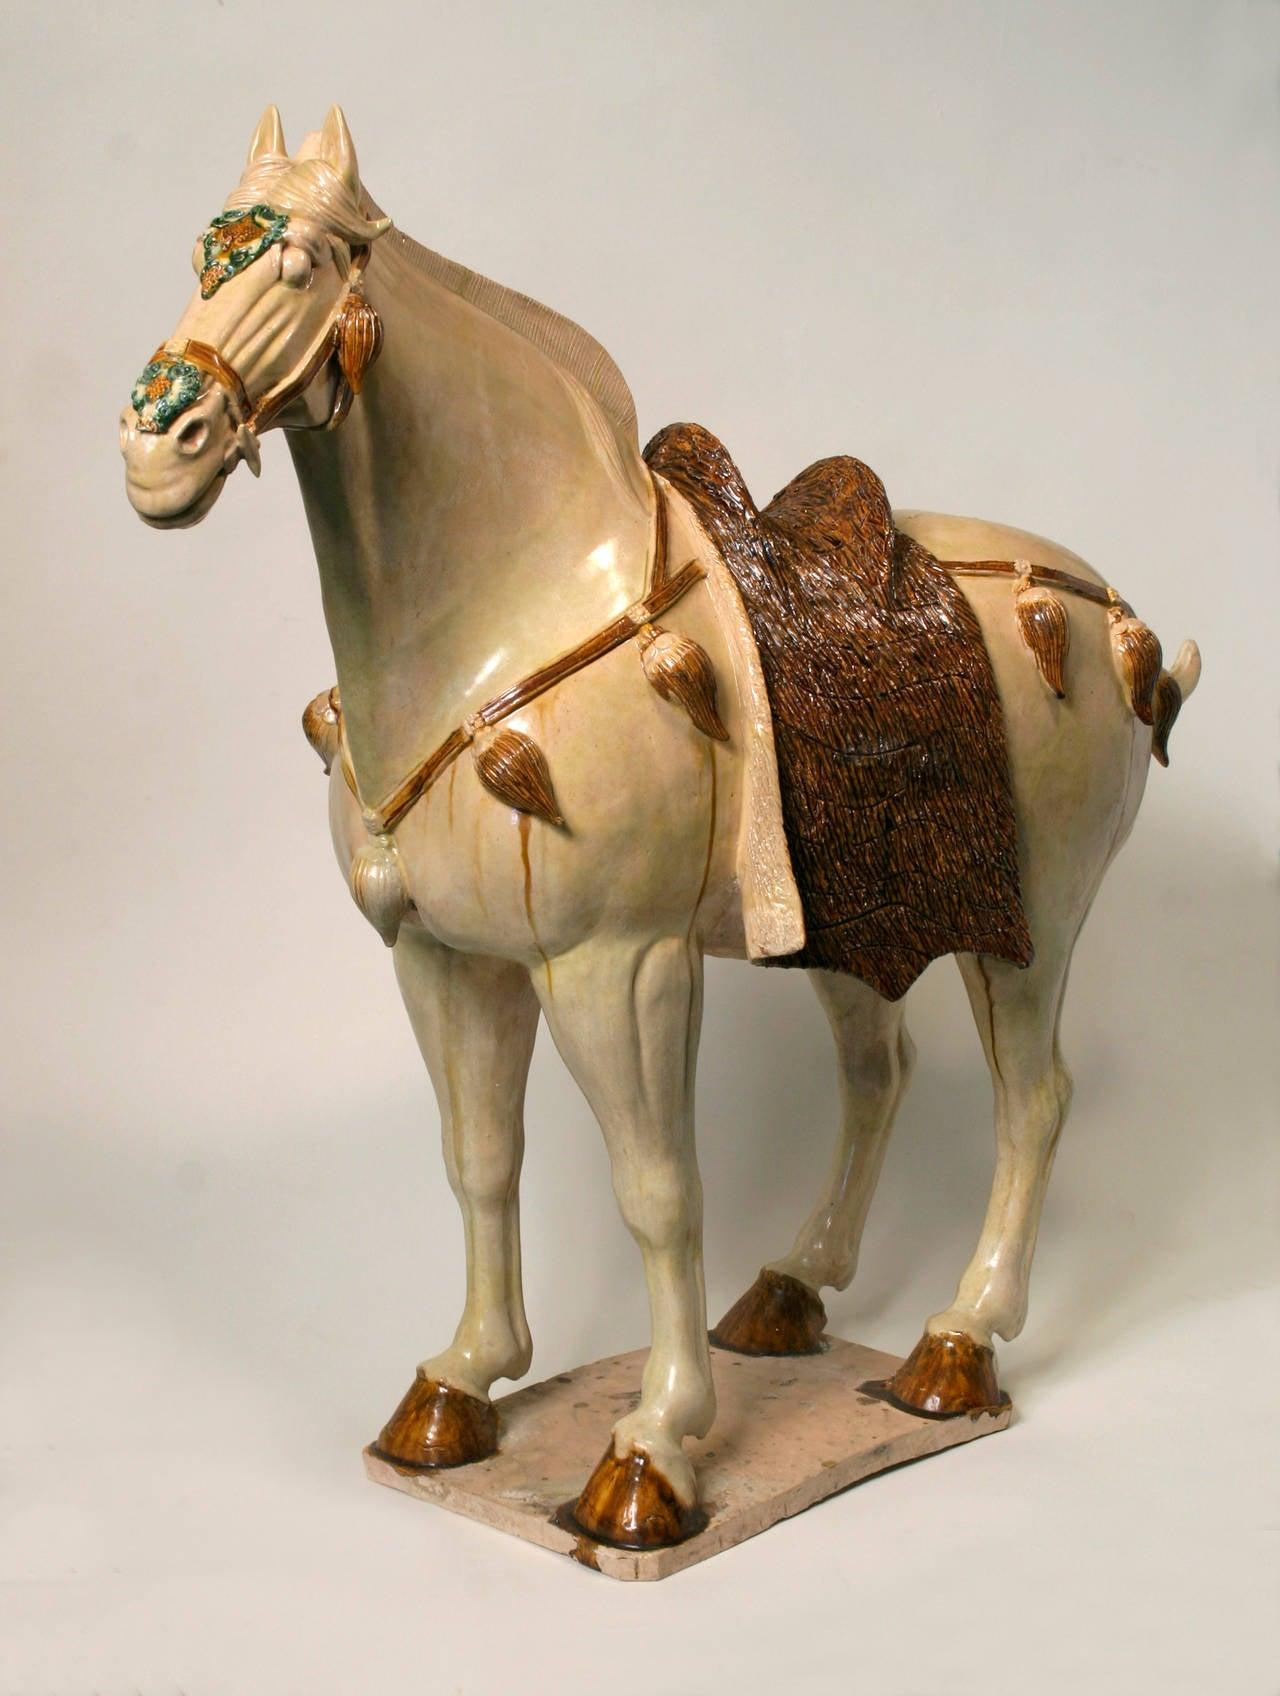 Sancai-Glazed Horse with Cut Fur Blanket